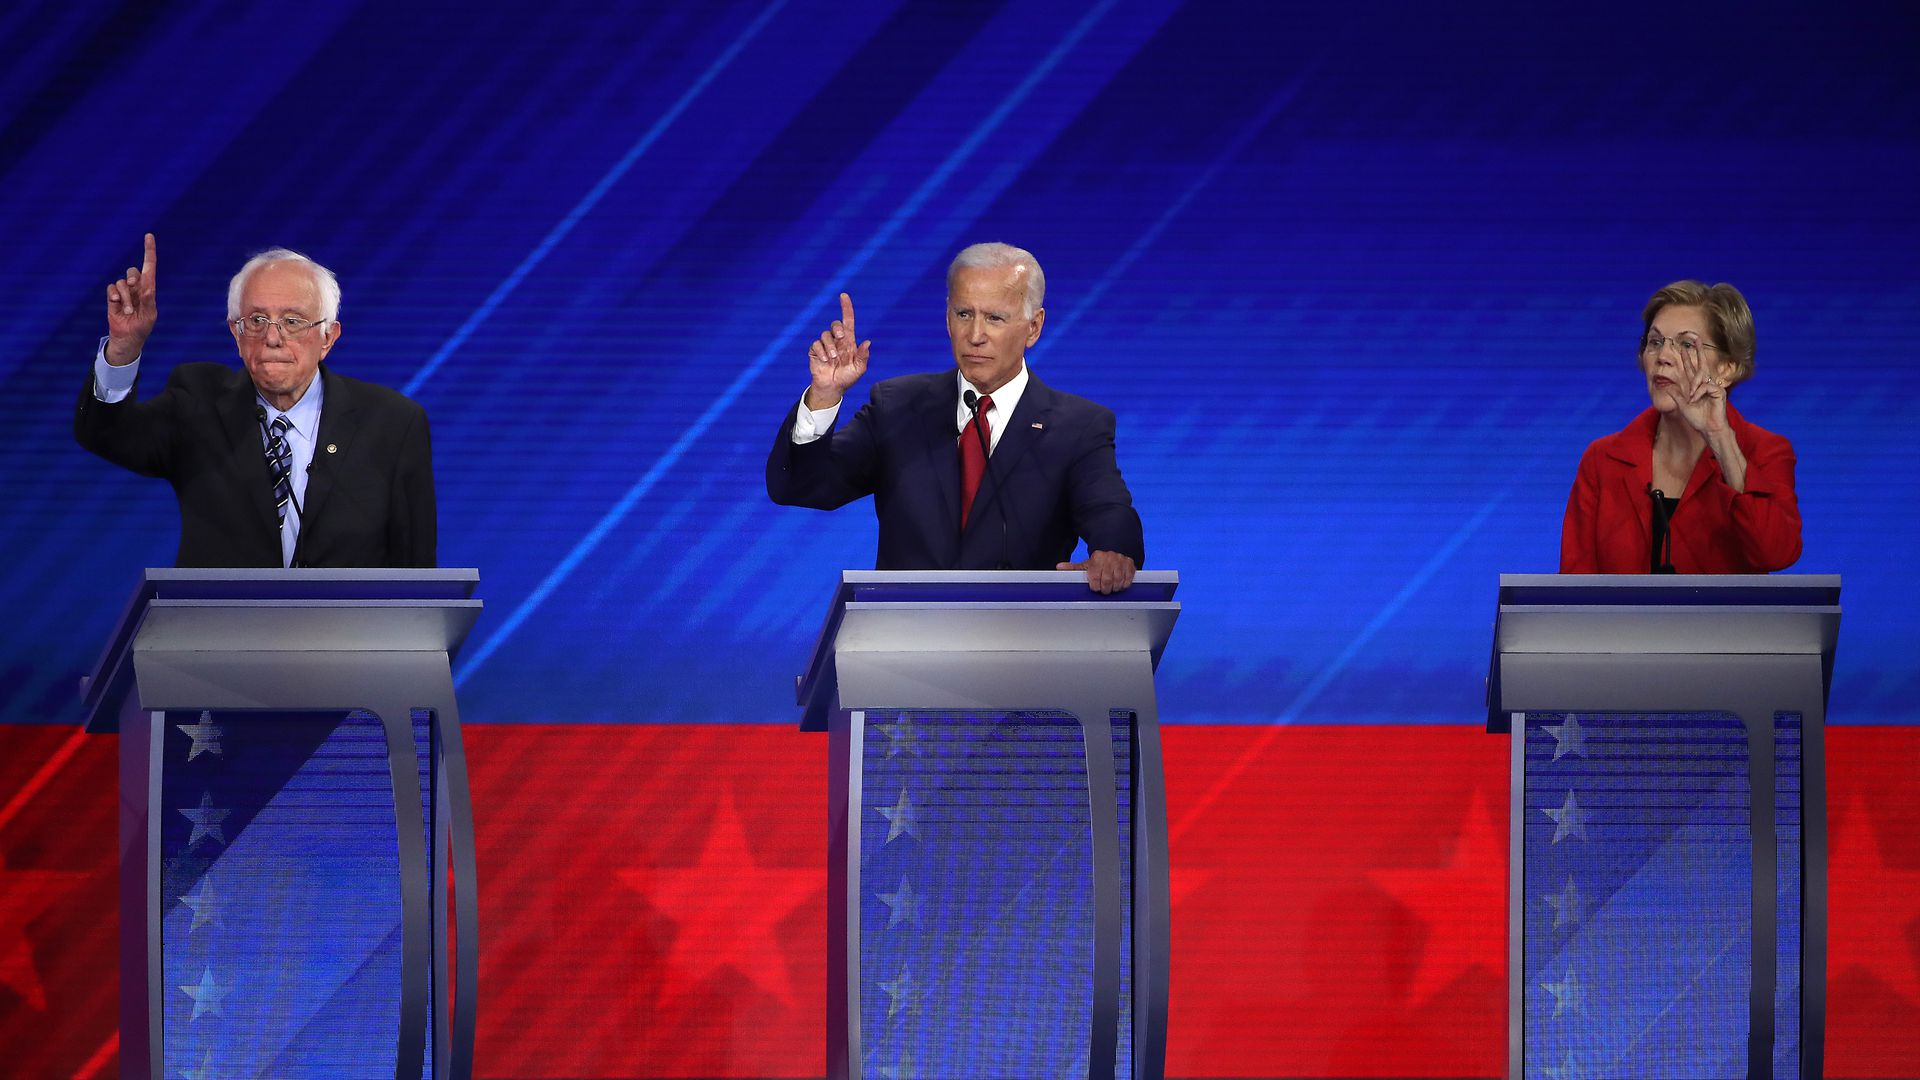 Bernie Sanders, Joe Biden and Elizabeth Warren, at the last Democratic presidential debate